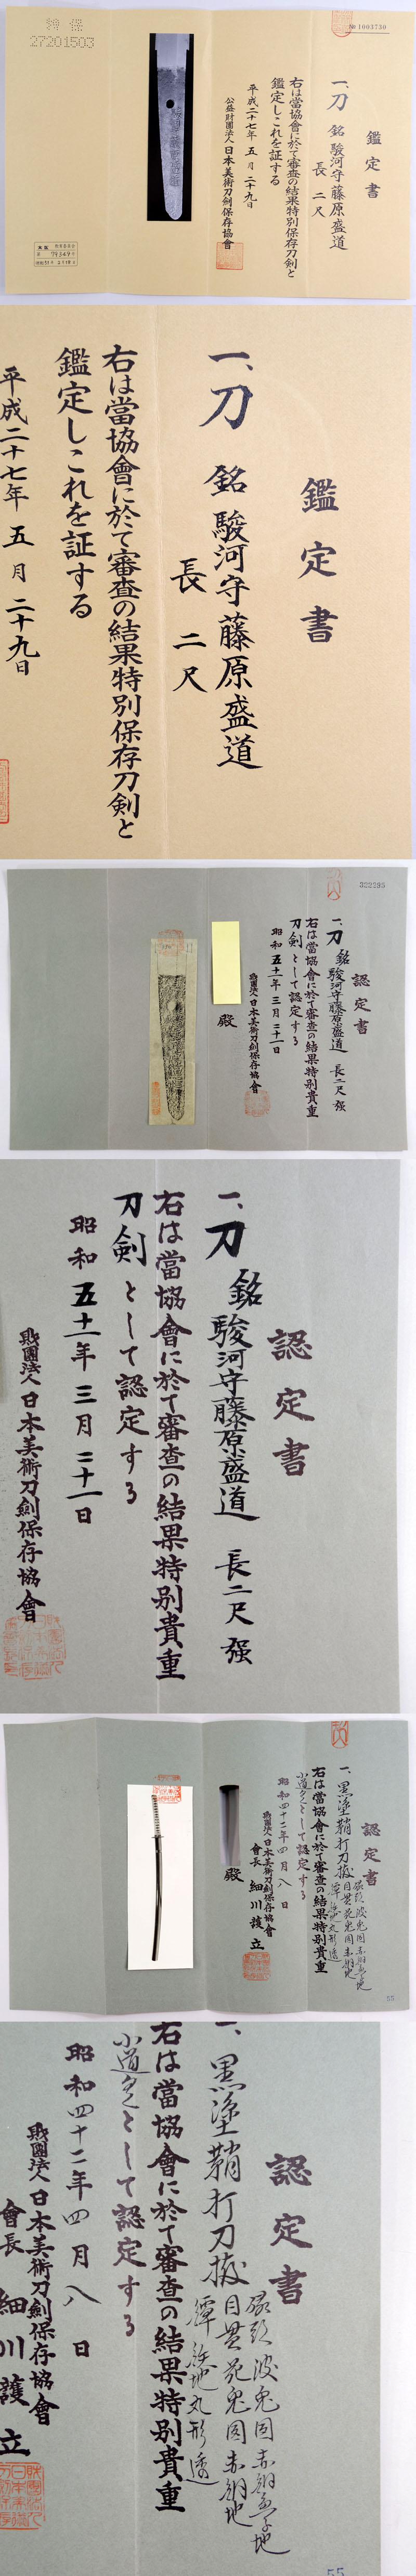 駿河守藤原盛道 (2代) Picture of Certificate